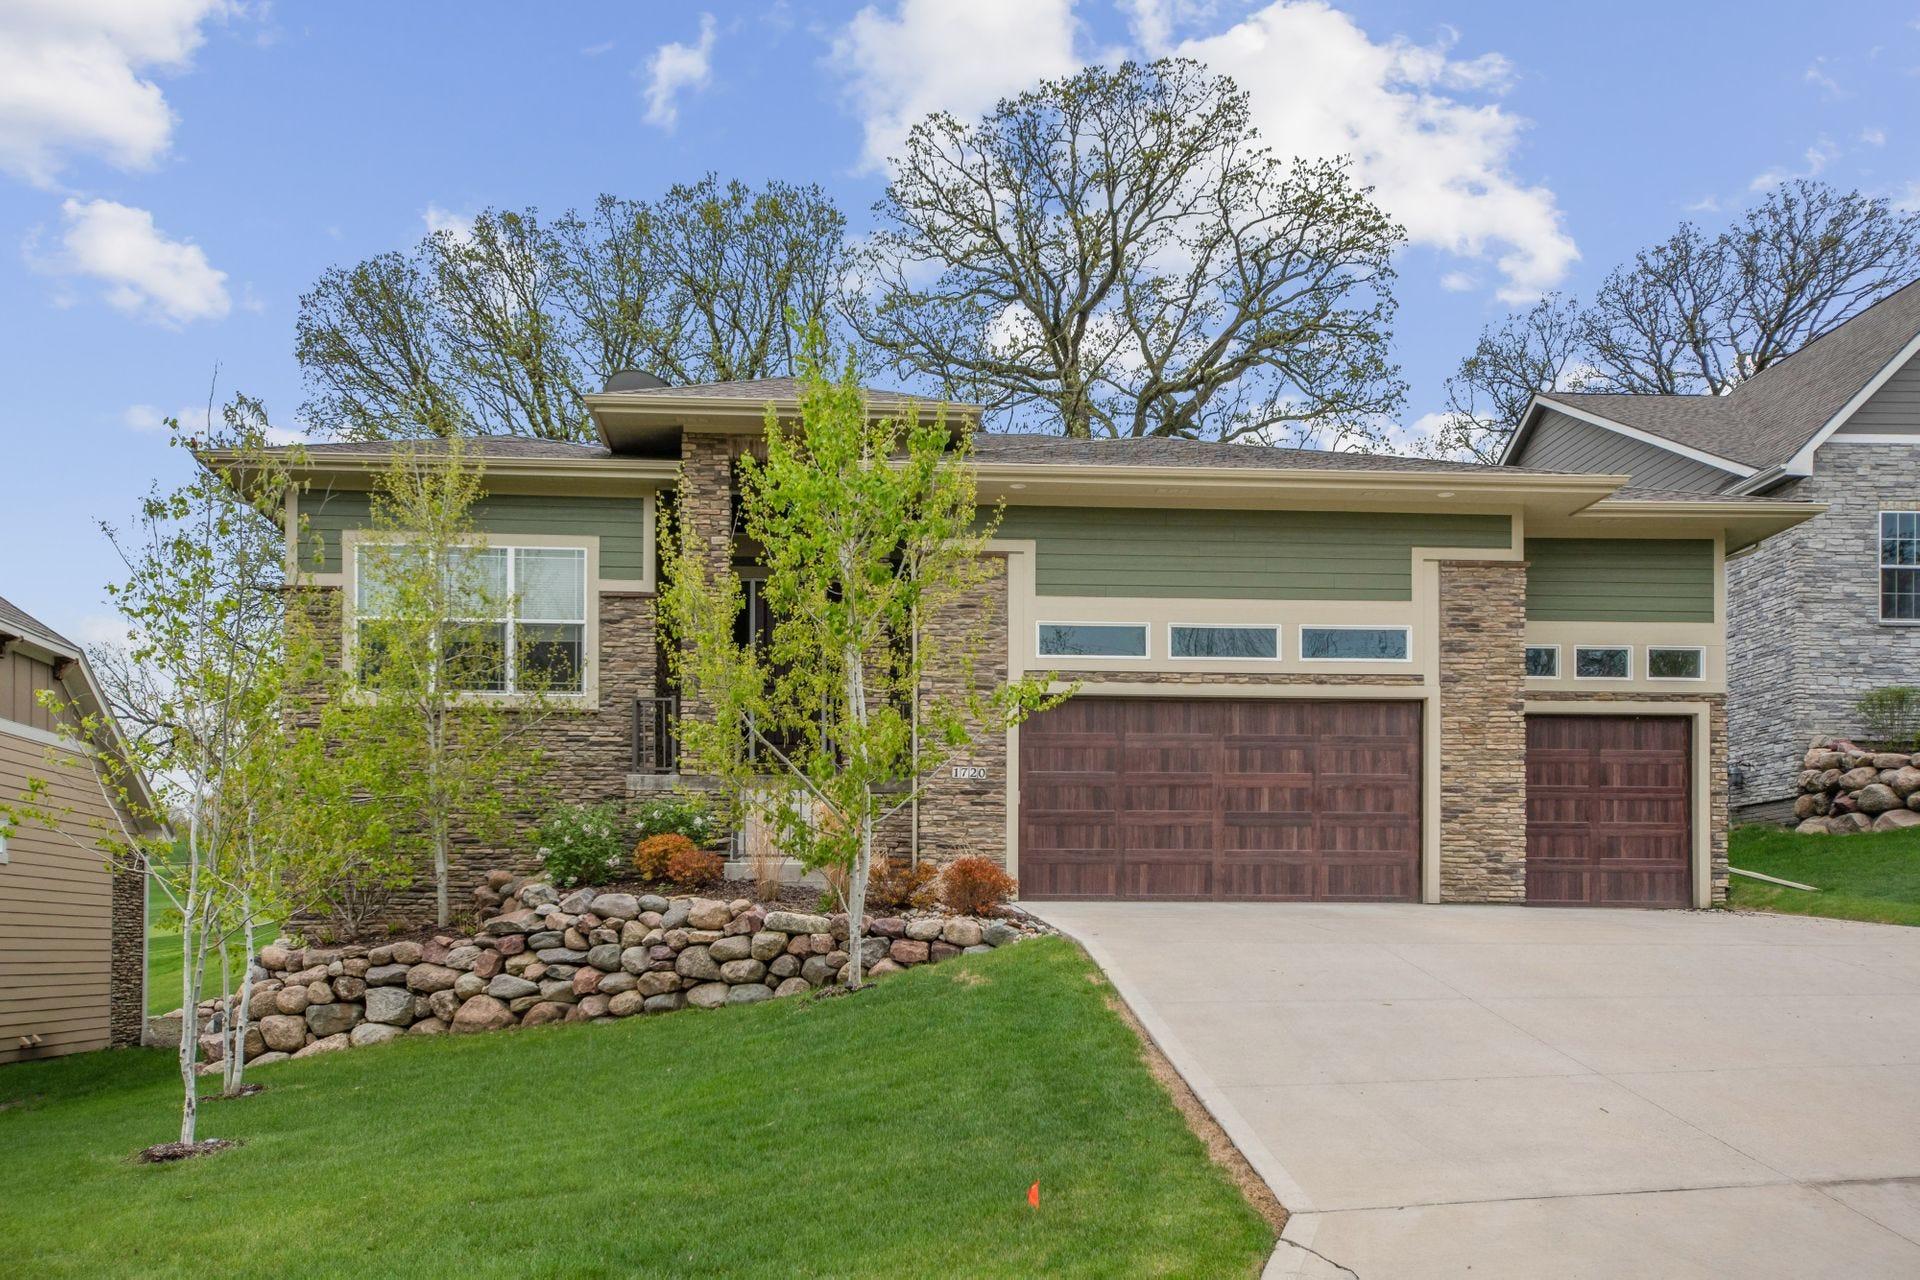 Mansion Monday: Home on Wakonda lists for $1.1M